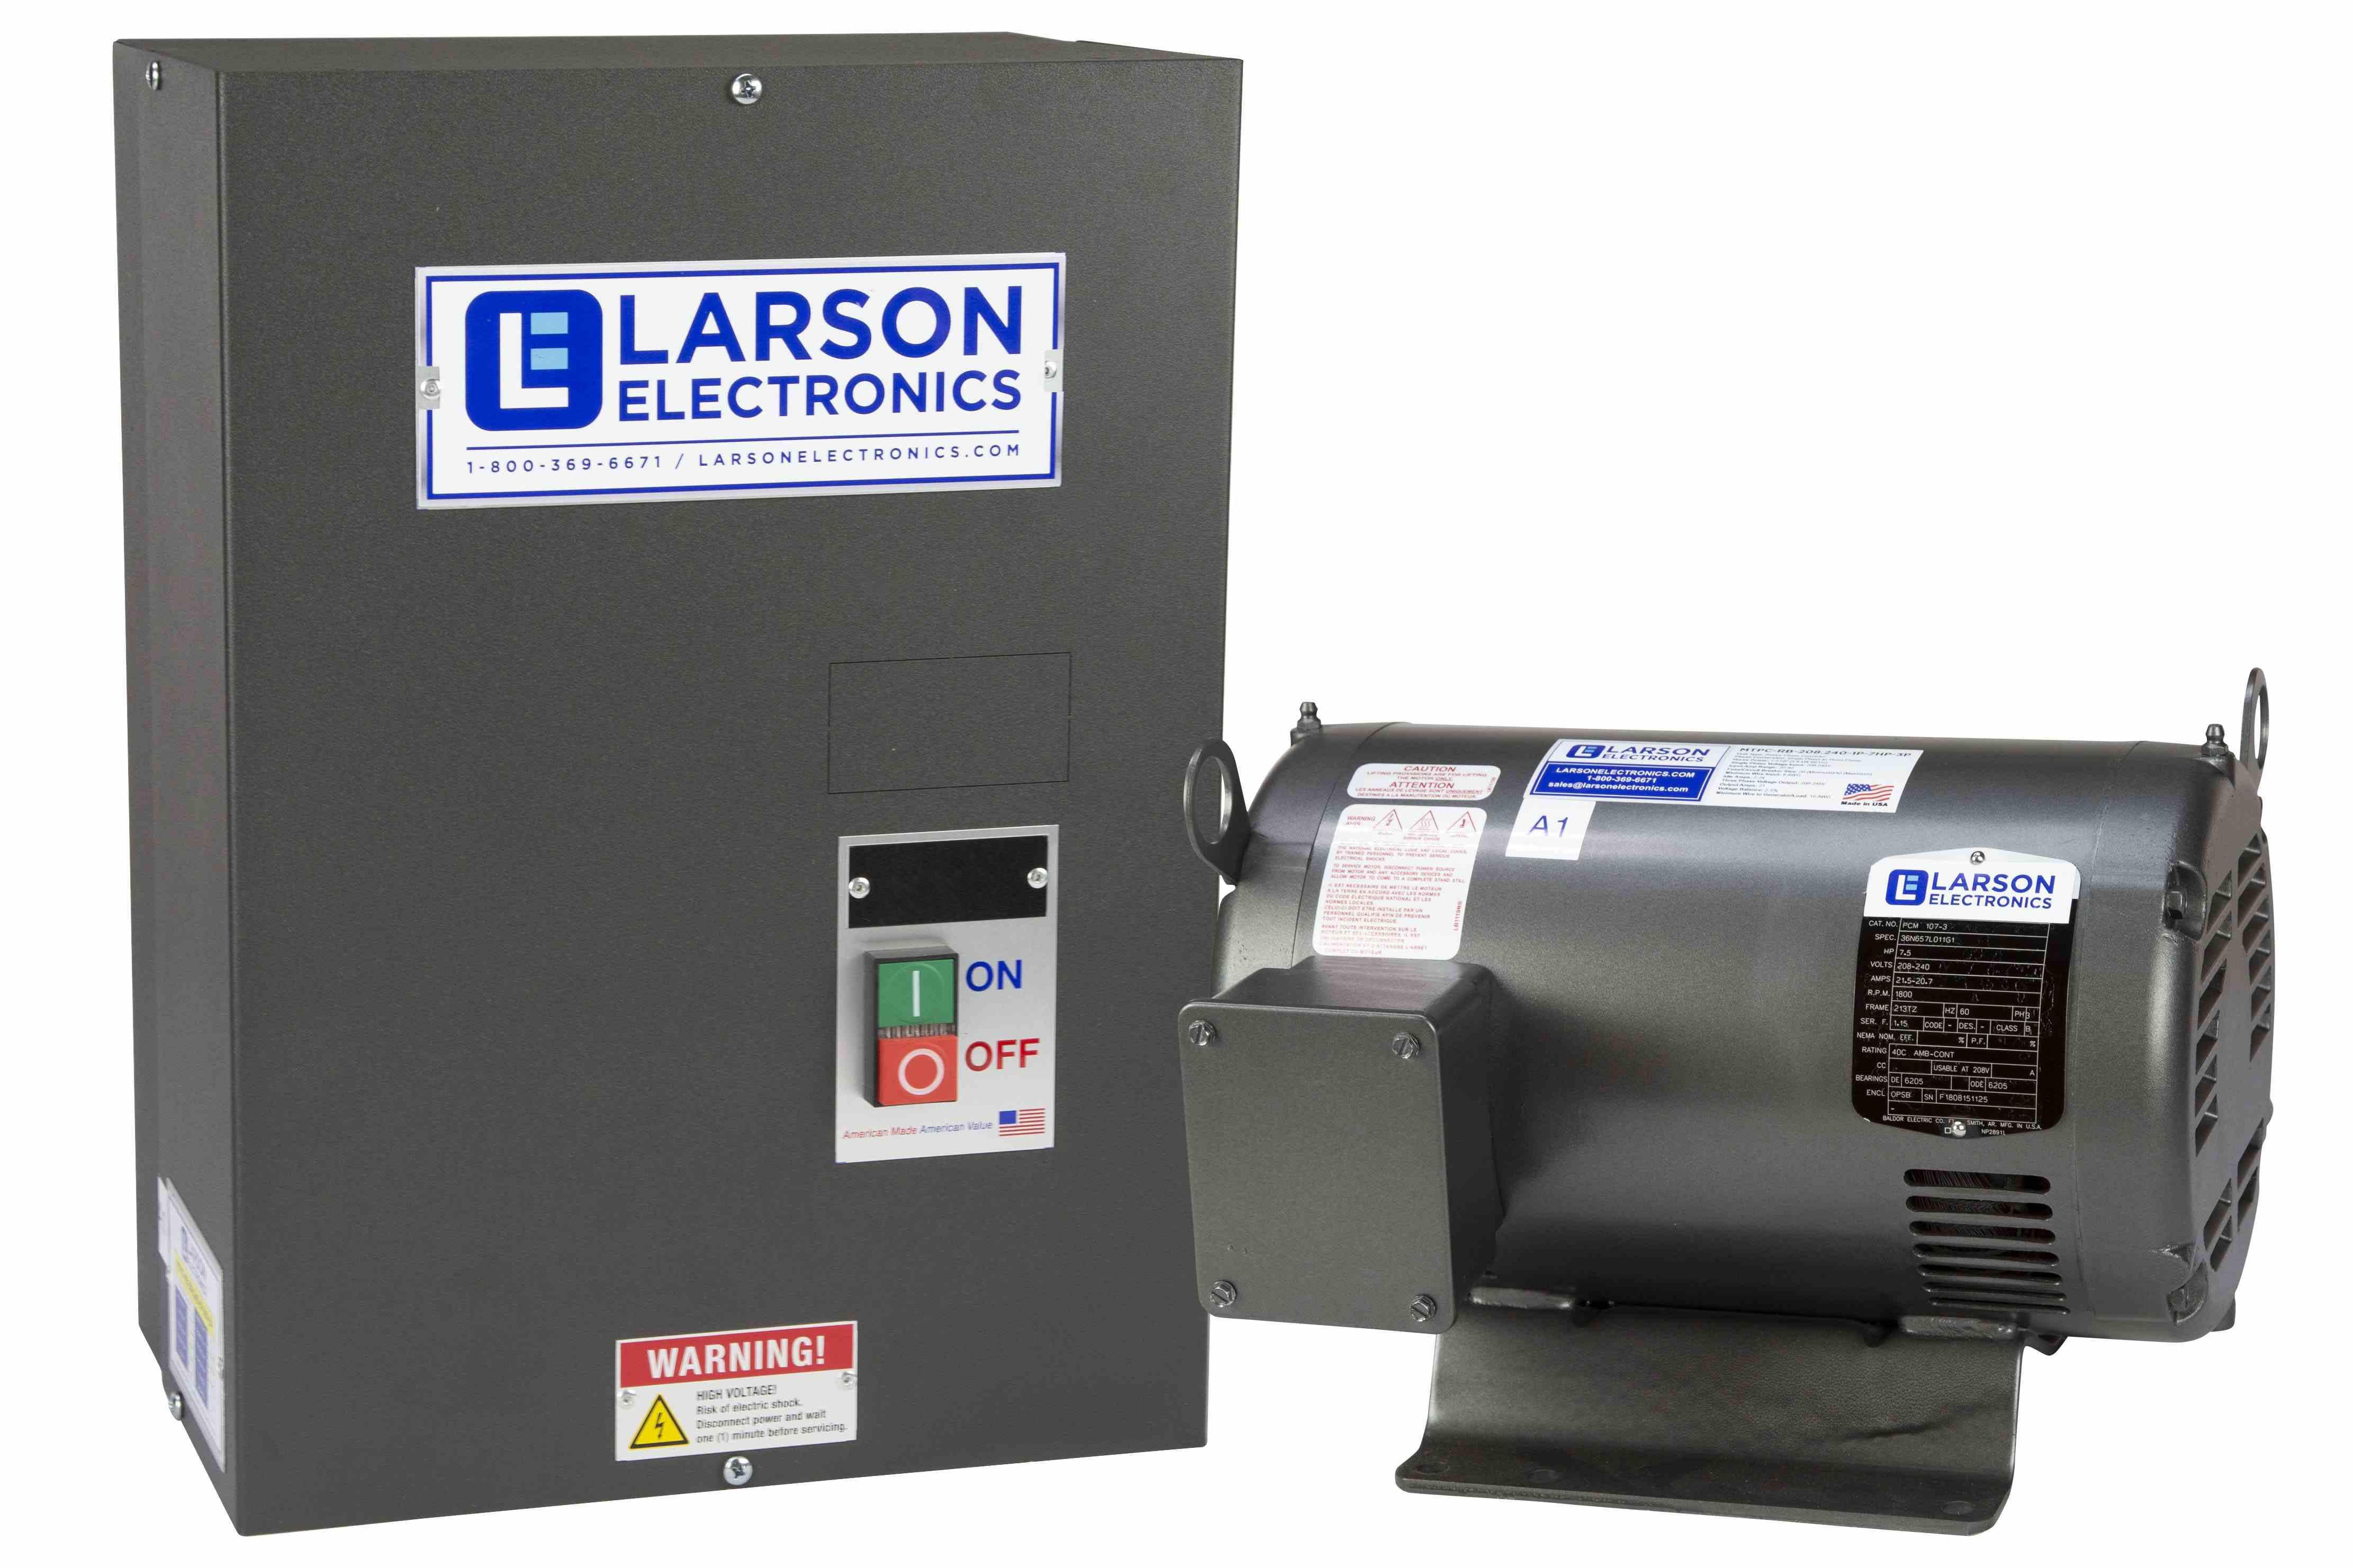 Rotary Phase Converter for 25HP Medium Loads, 208V 1PH to 3PH, 75.6 Amps Output, 40HP Idler, NEMA 1